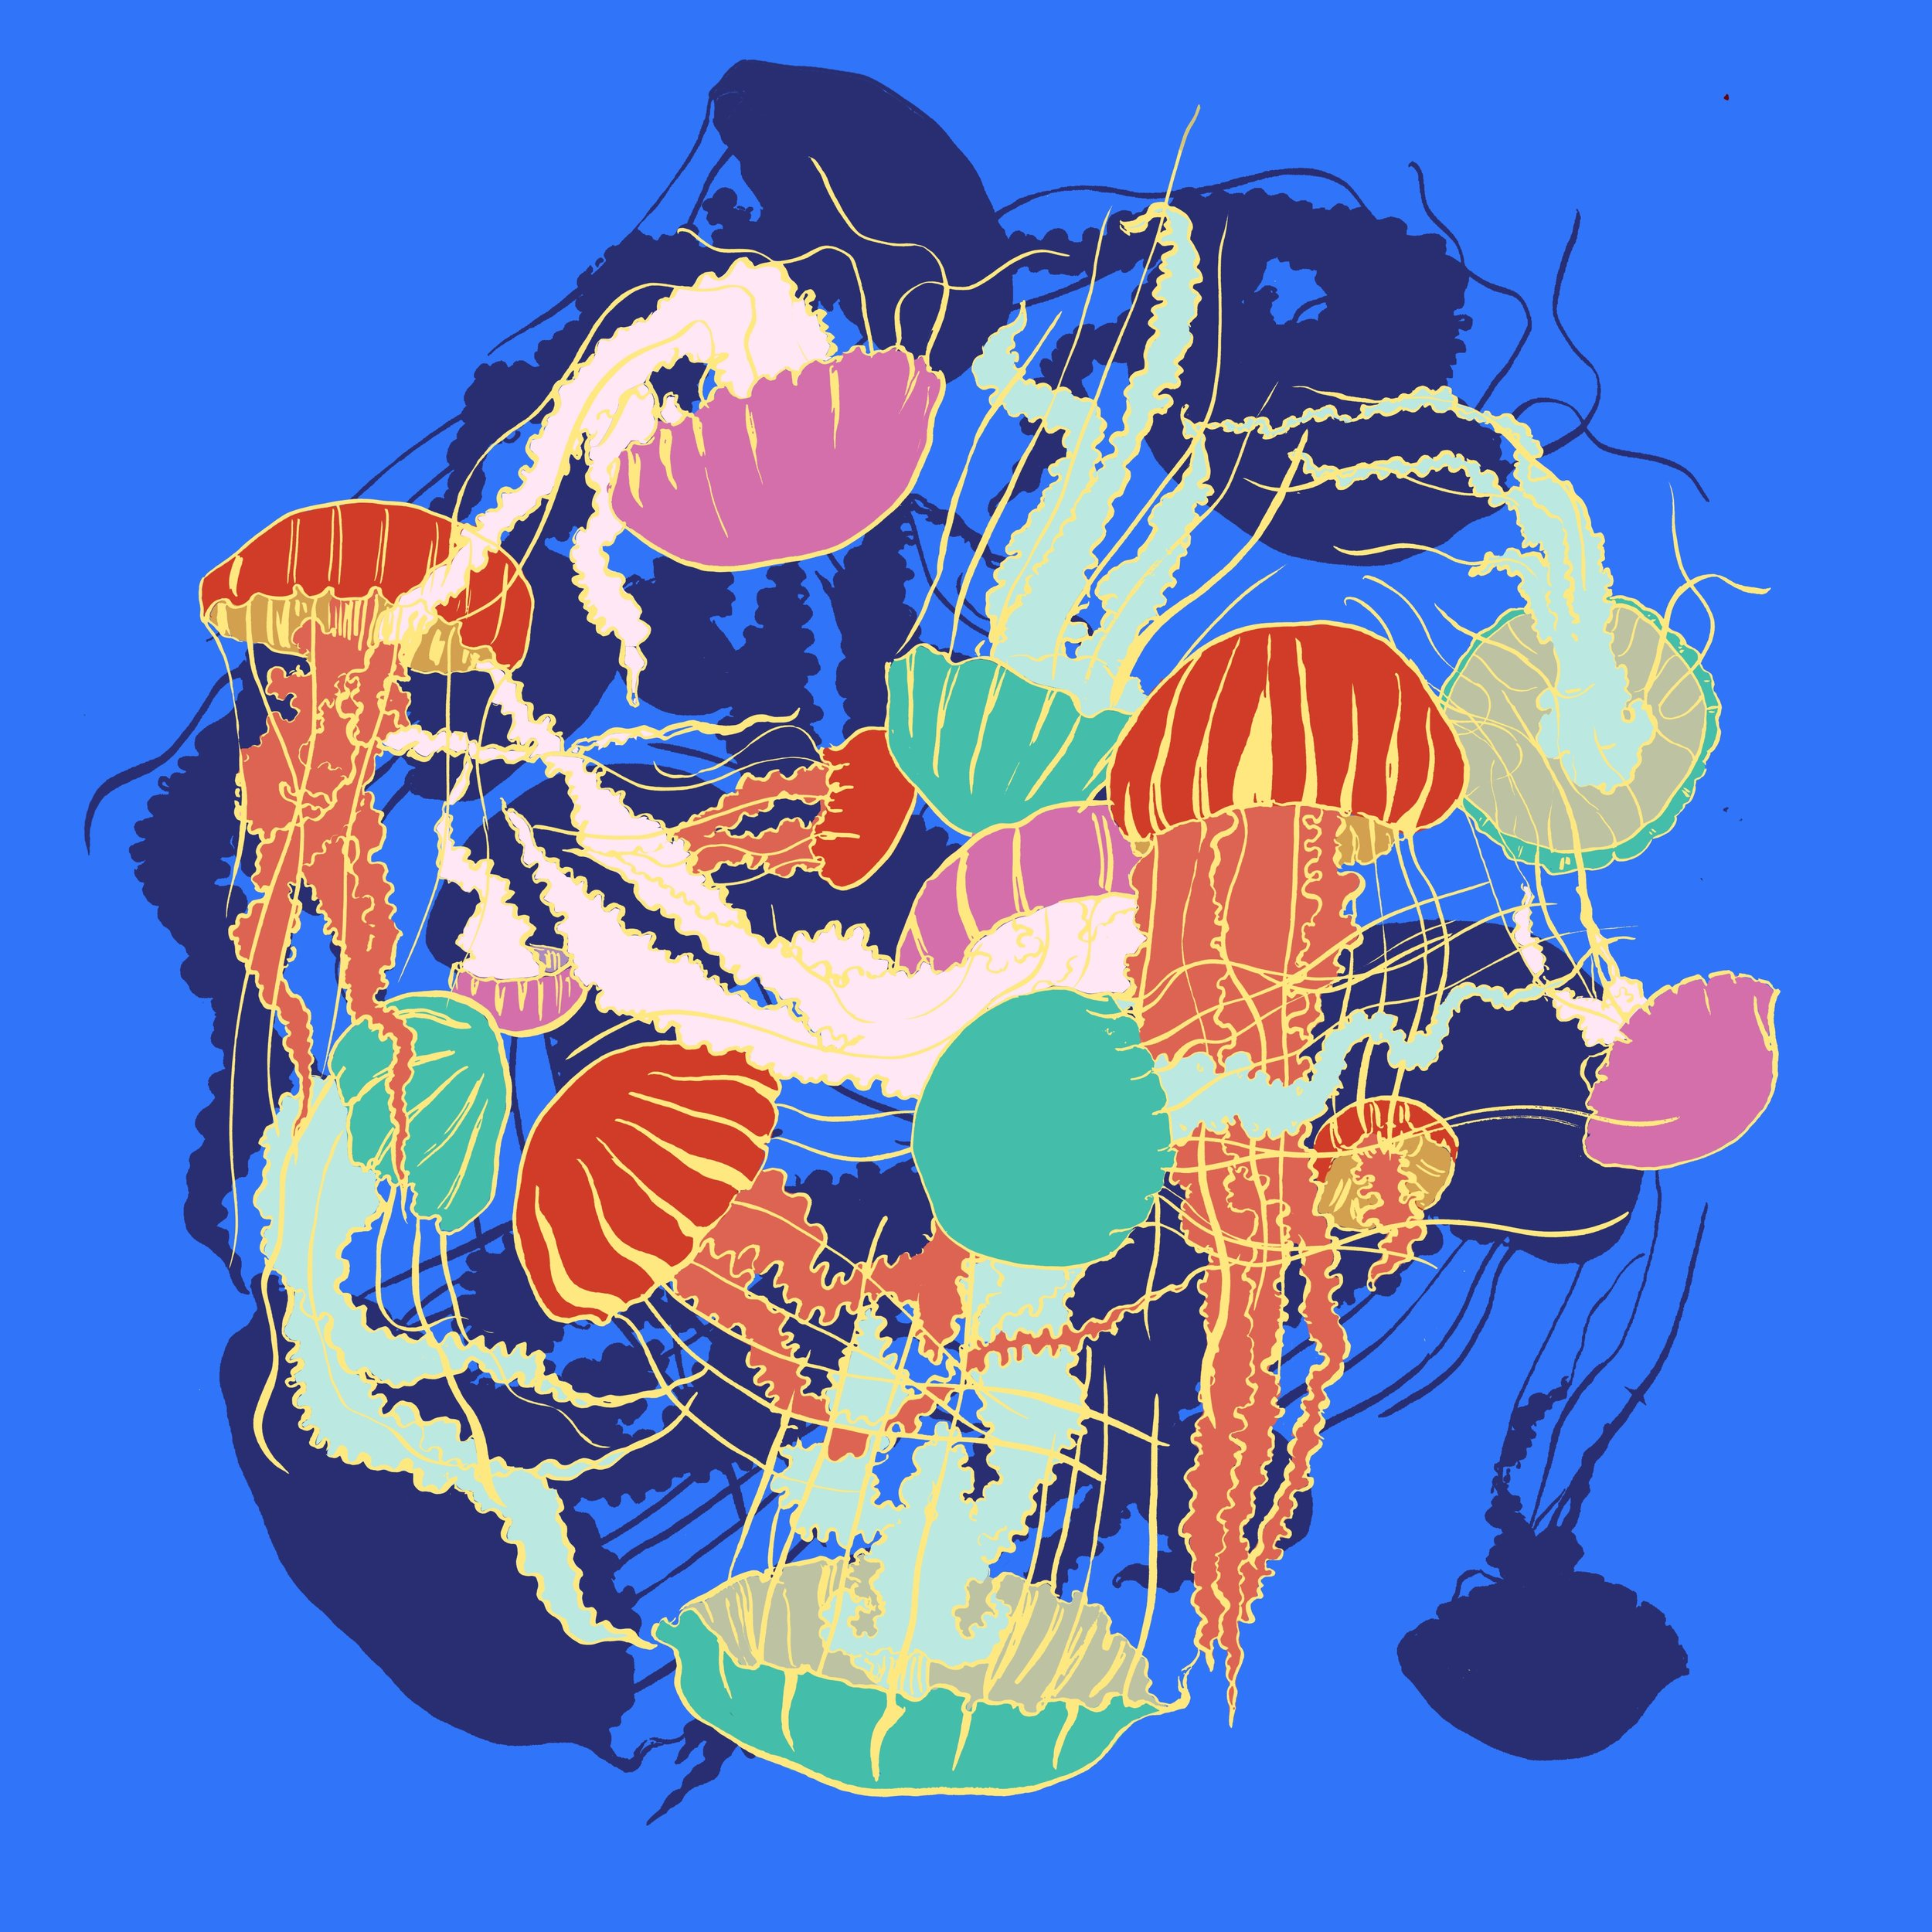 Jellyfish_Crowd.jpg